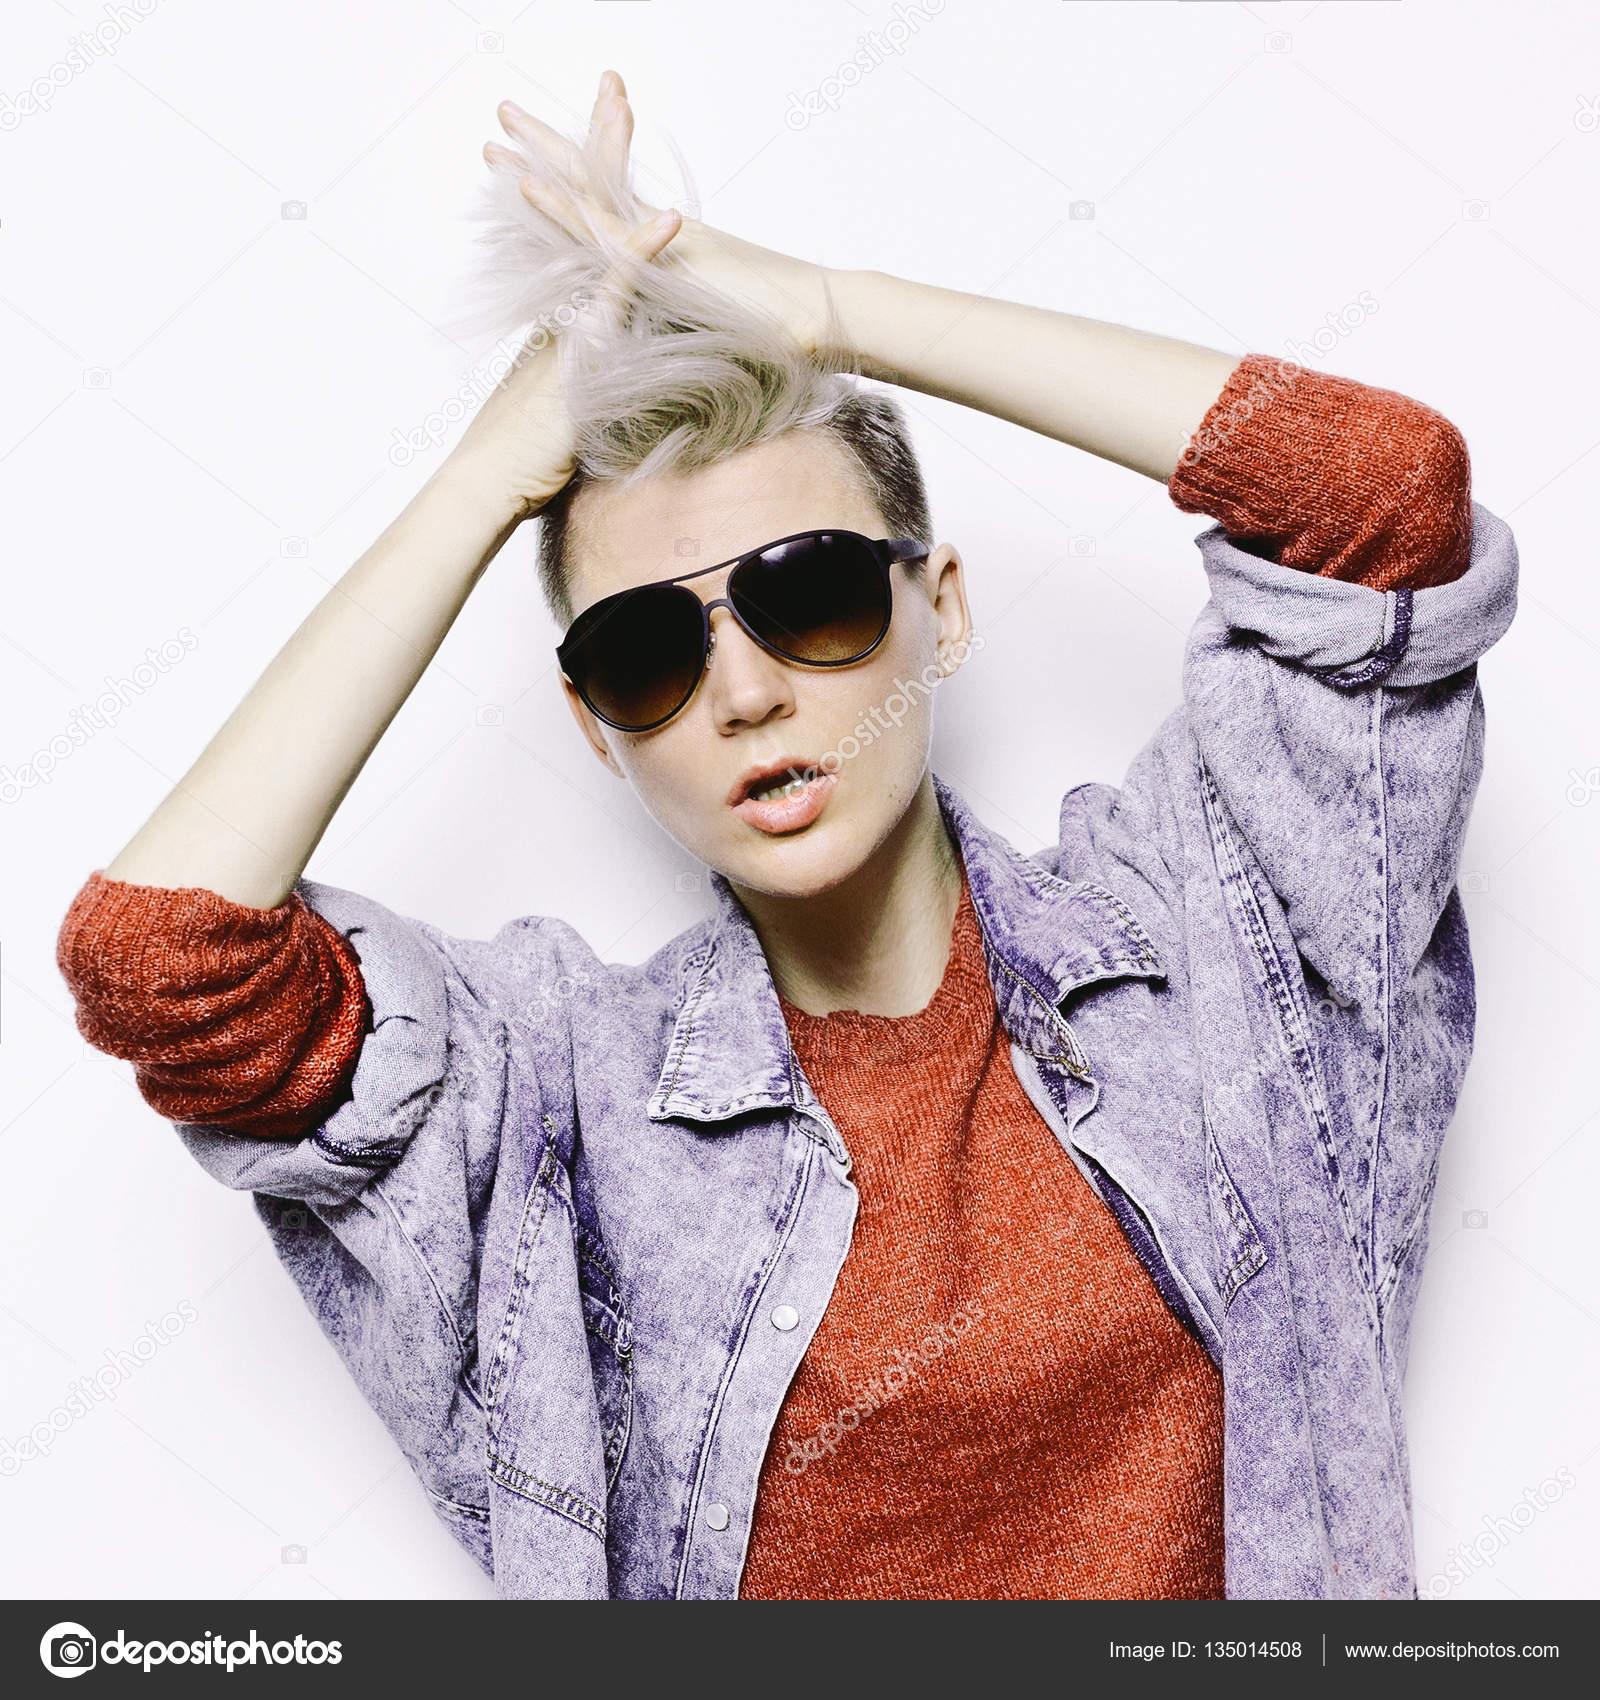 b2abfba0870d7 Elegante loira com cabelo curto. Glamourosa Tomboy hipster moda óculos de  sol punk rock estilo — Foto de Porechenskaya